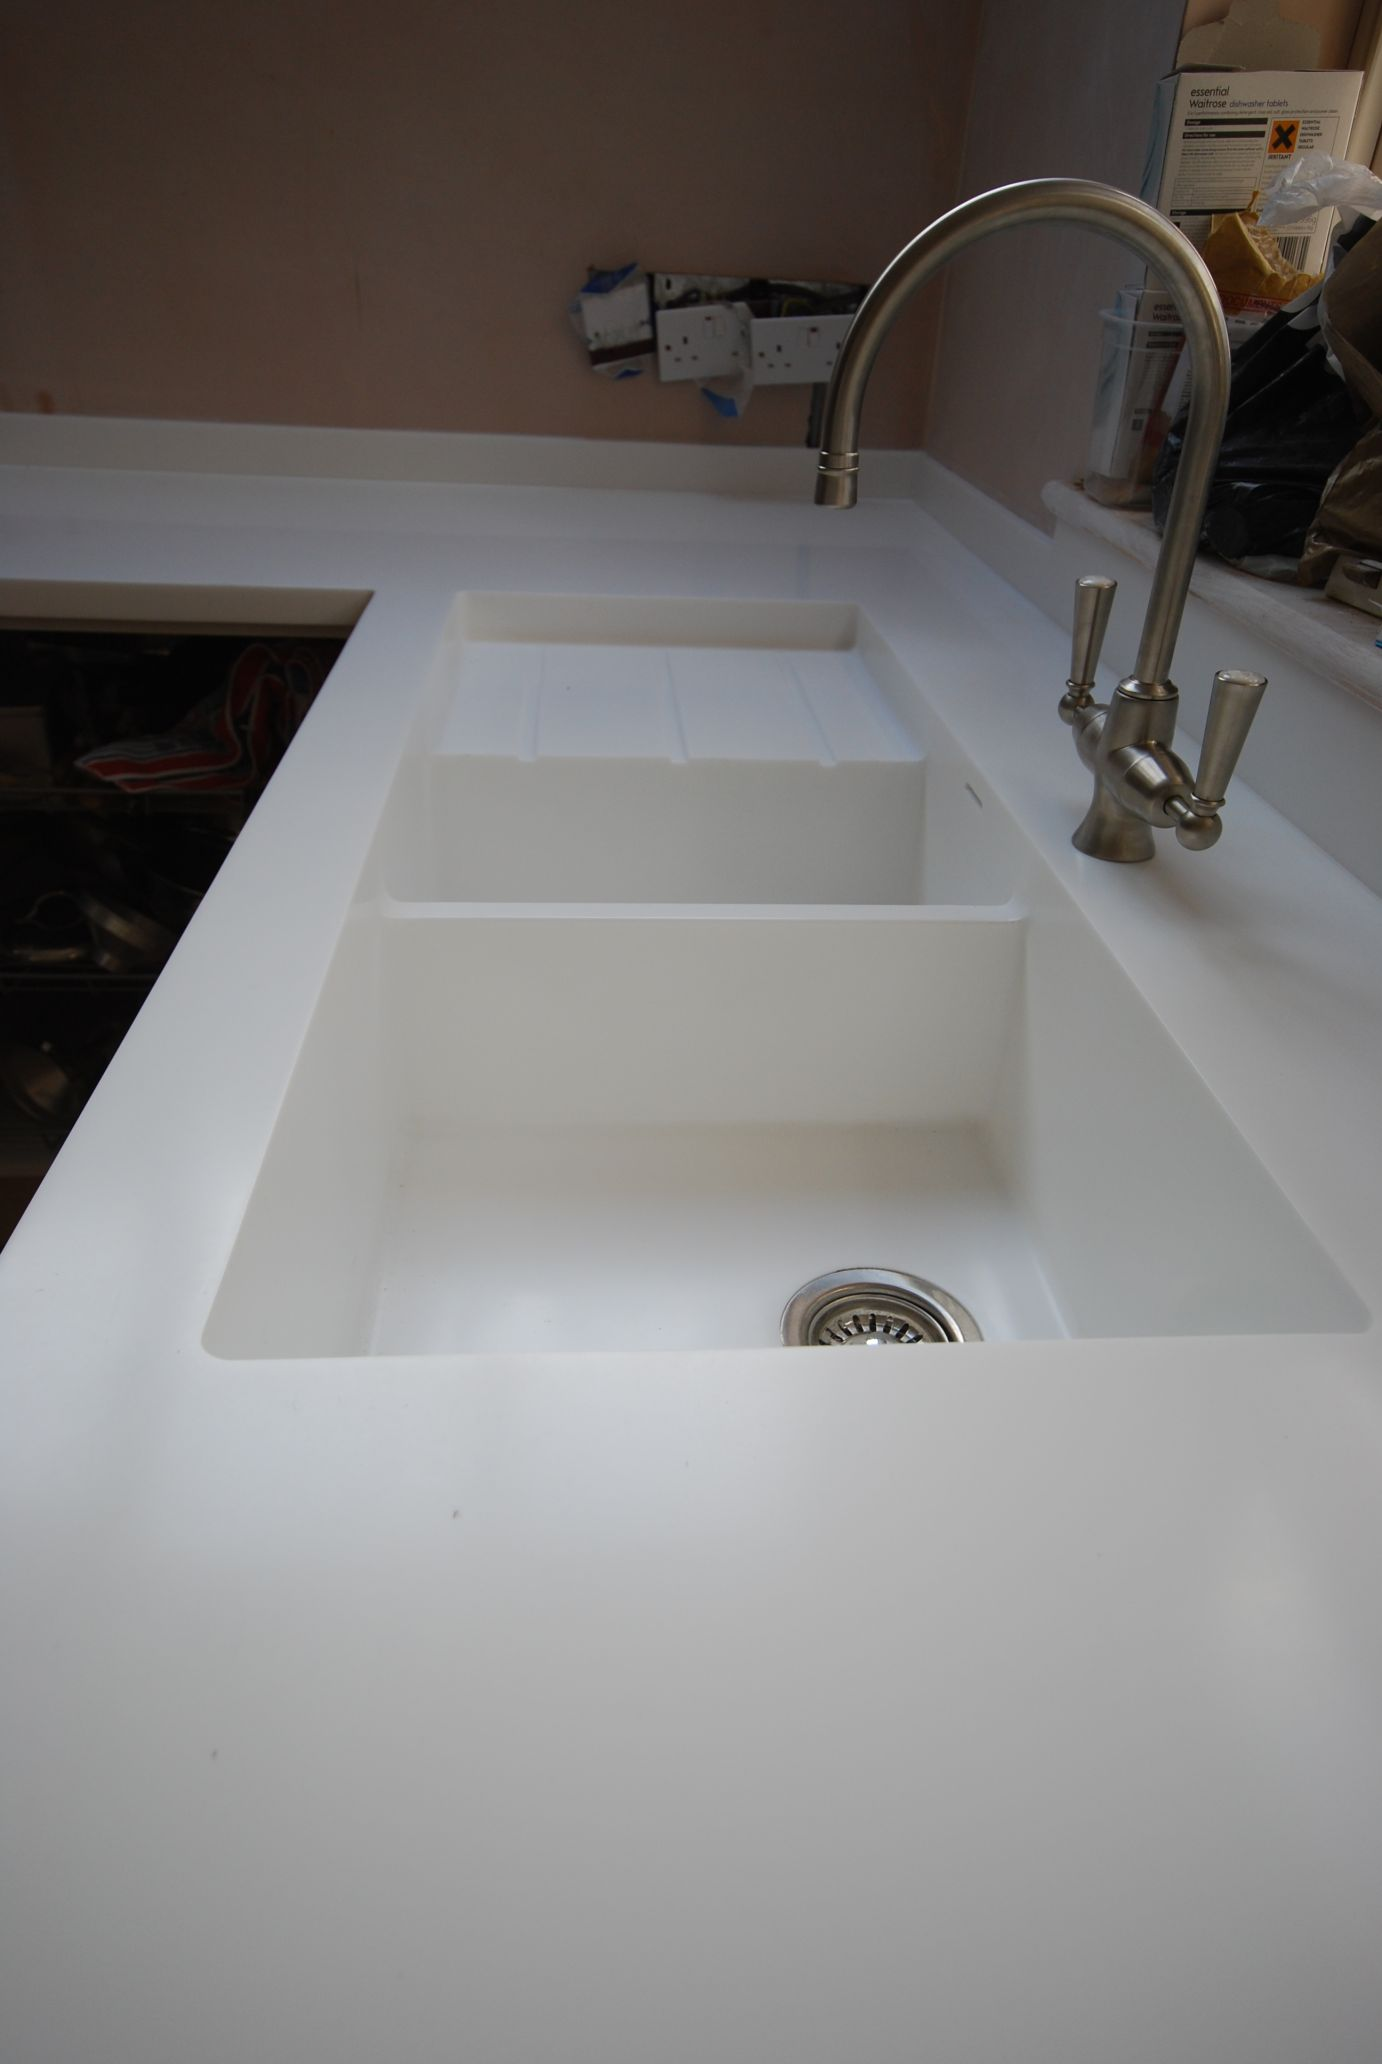 Charming Custom Corian/HI MACS 1 1/2 Bowl Sink